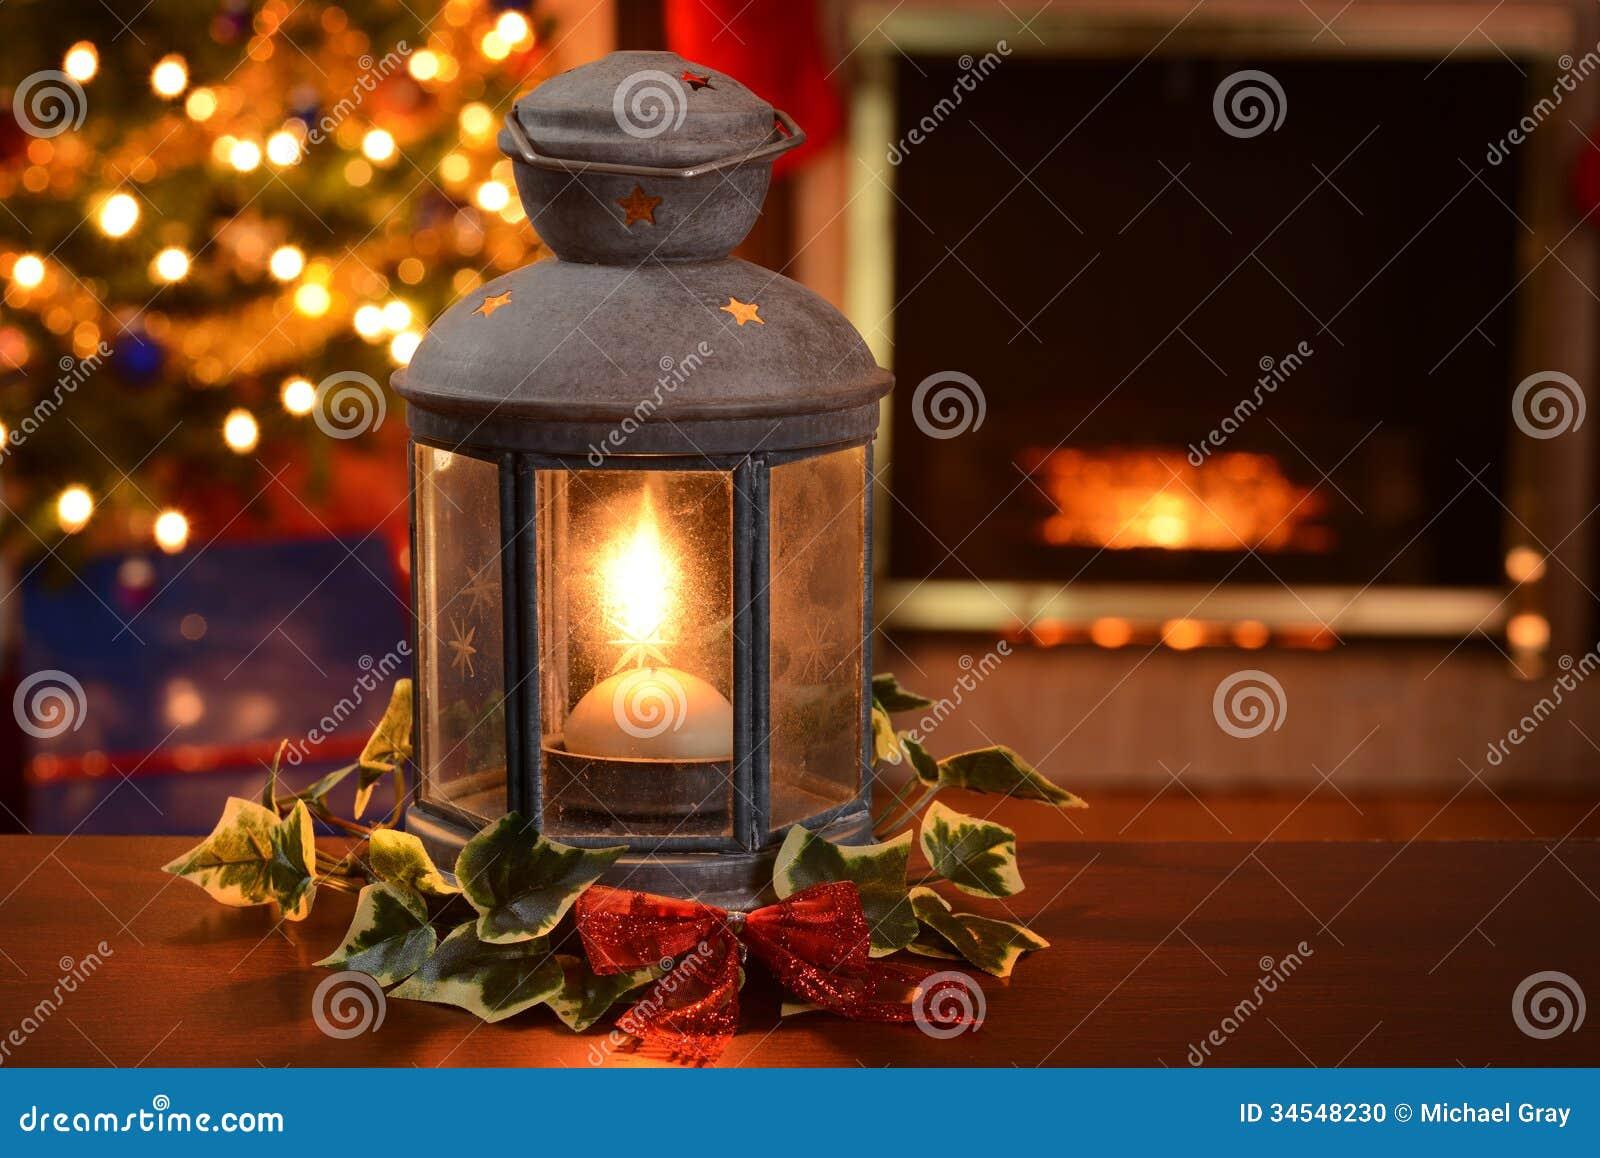 Christmas Lantern Stock Photo - Image: 34548230